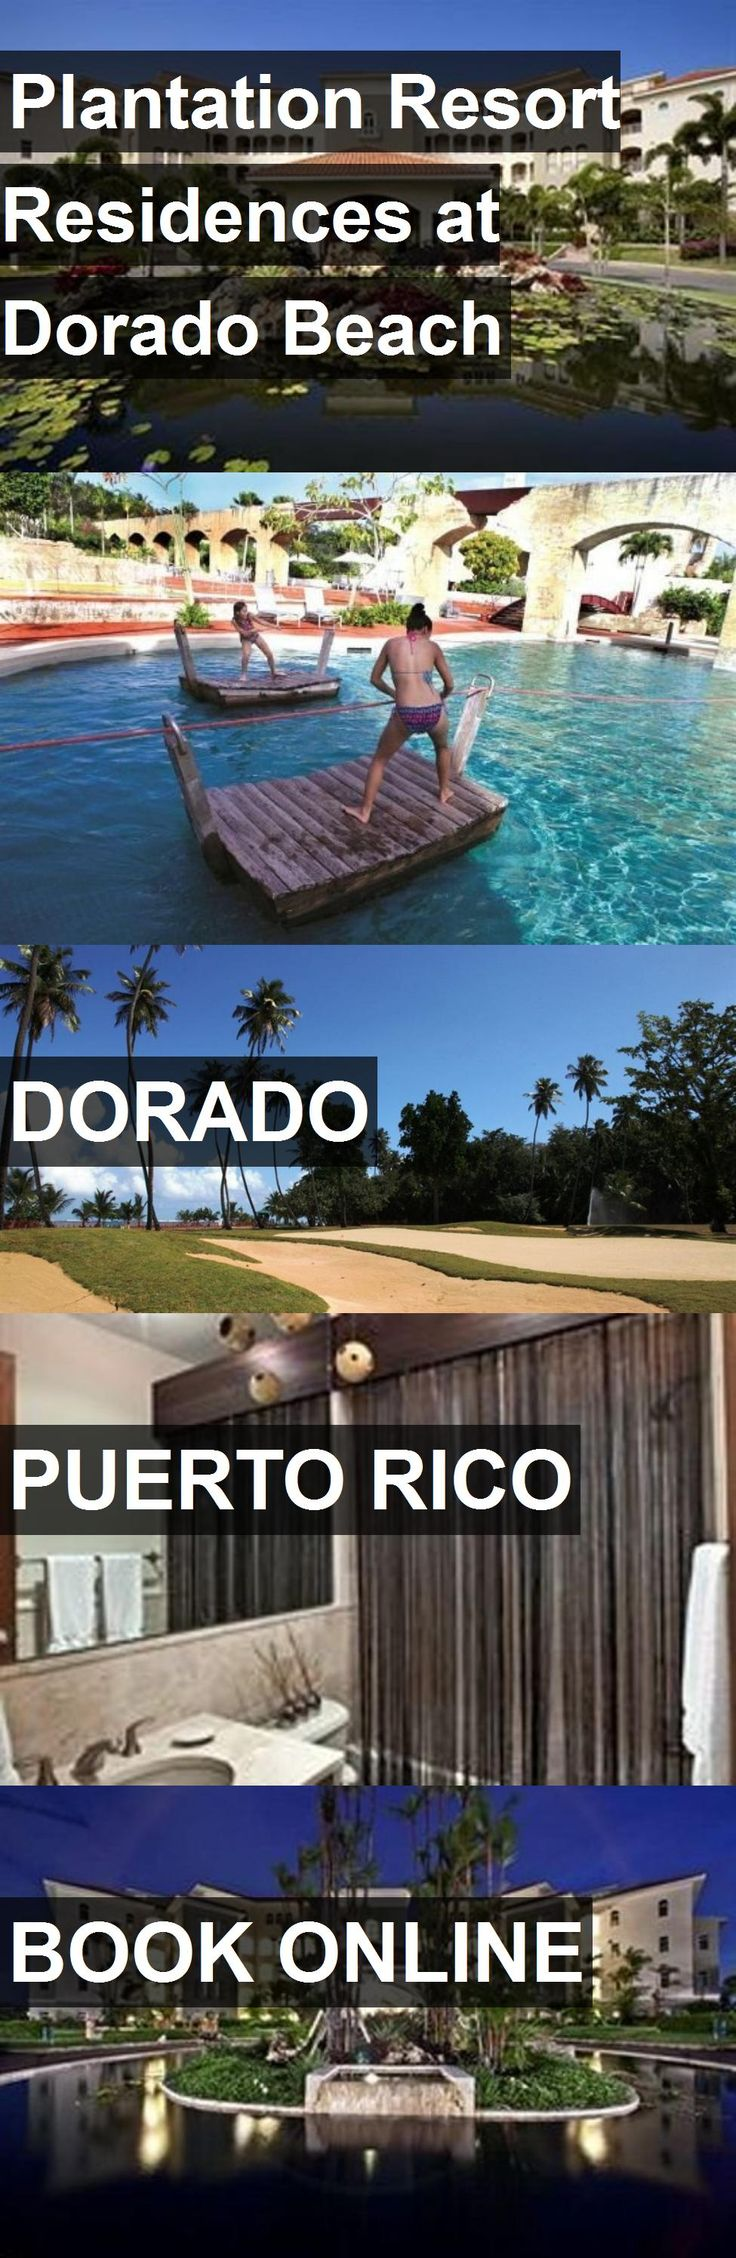 Hotel Plantation Resort Residences at Dorado Beach in Dorado, Puerto Rico. For more information, photos, reviews and best prices please follow the link. #PuertoRico #Dorado #travel #vacation #hotel